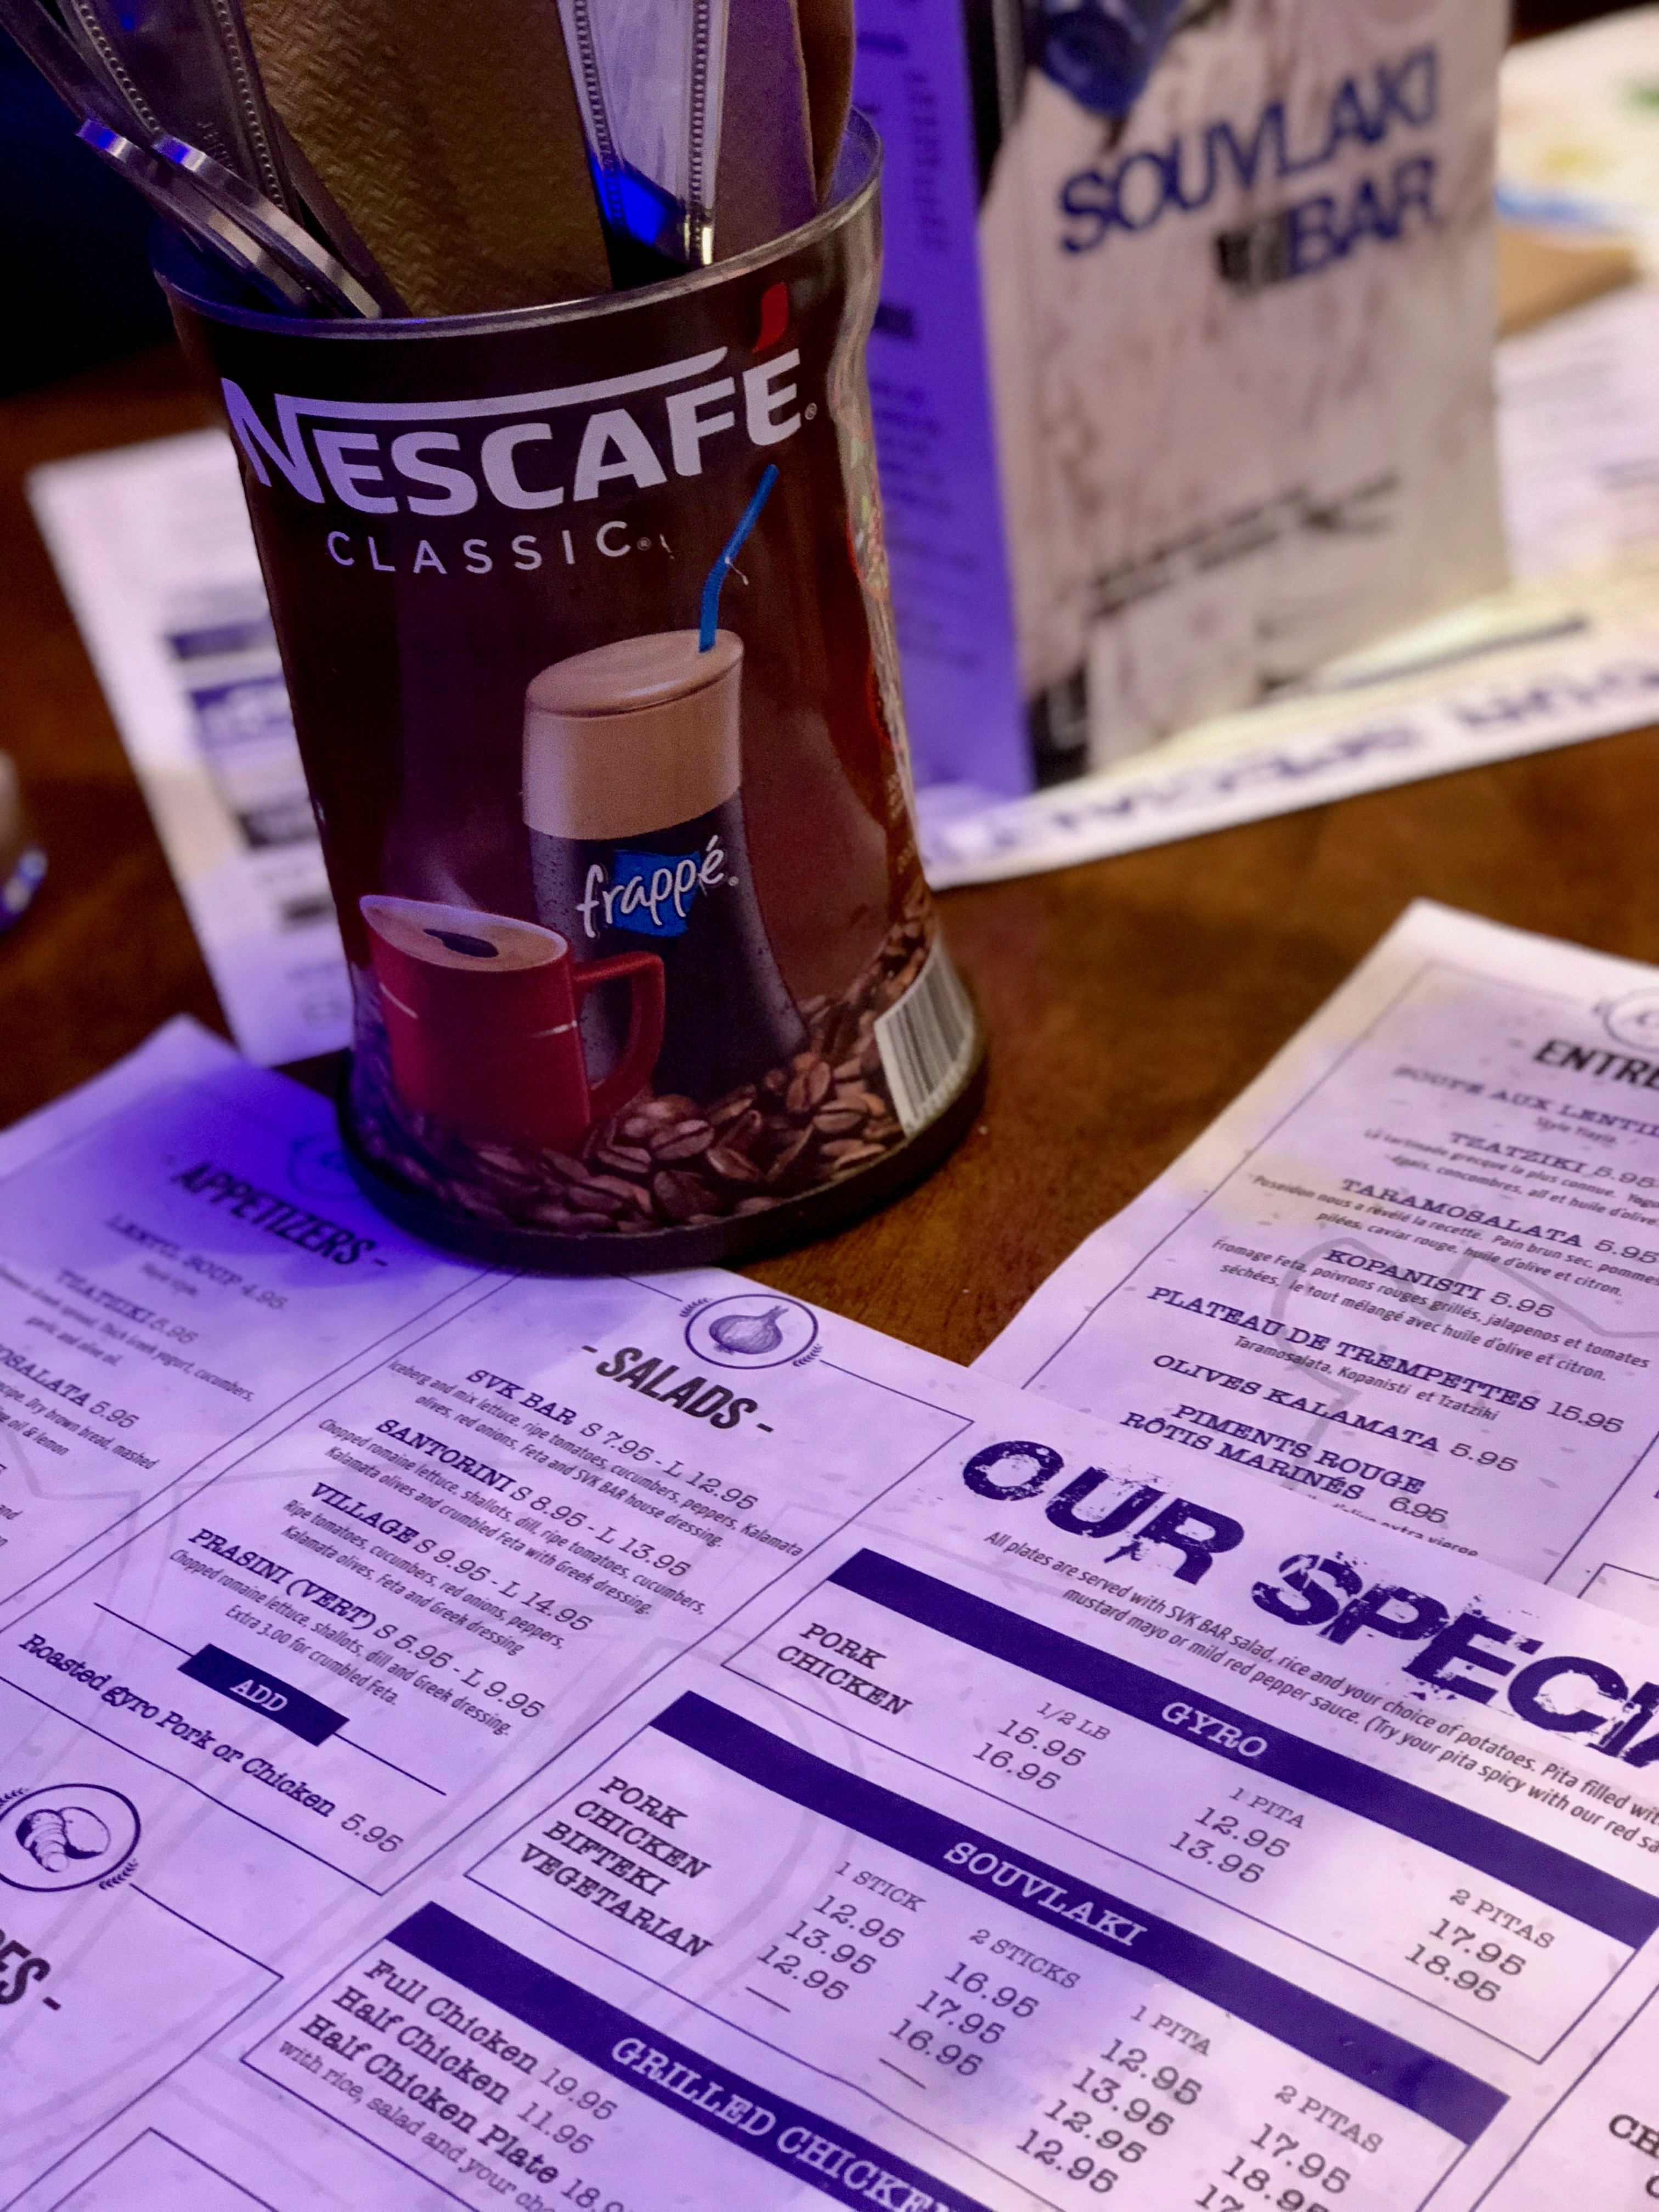 Kid Friendly Restaurants in Montreal: Souvlaki Bar